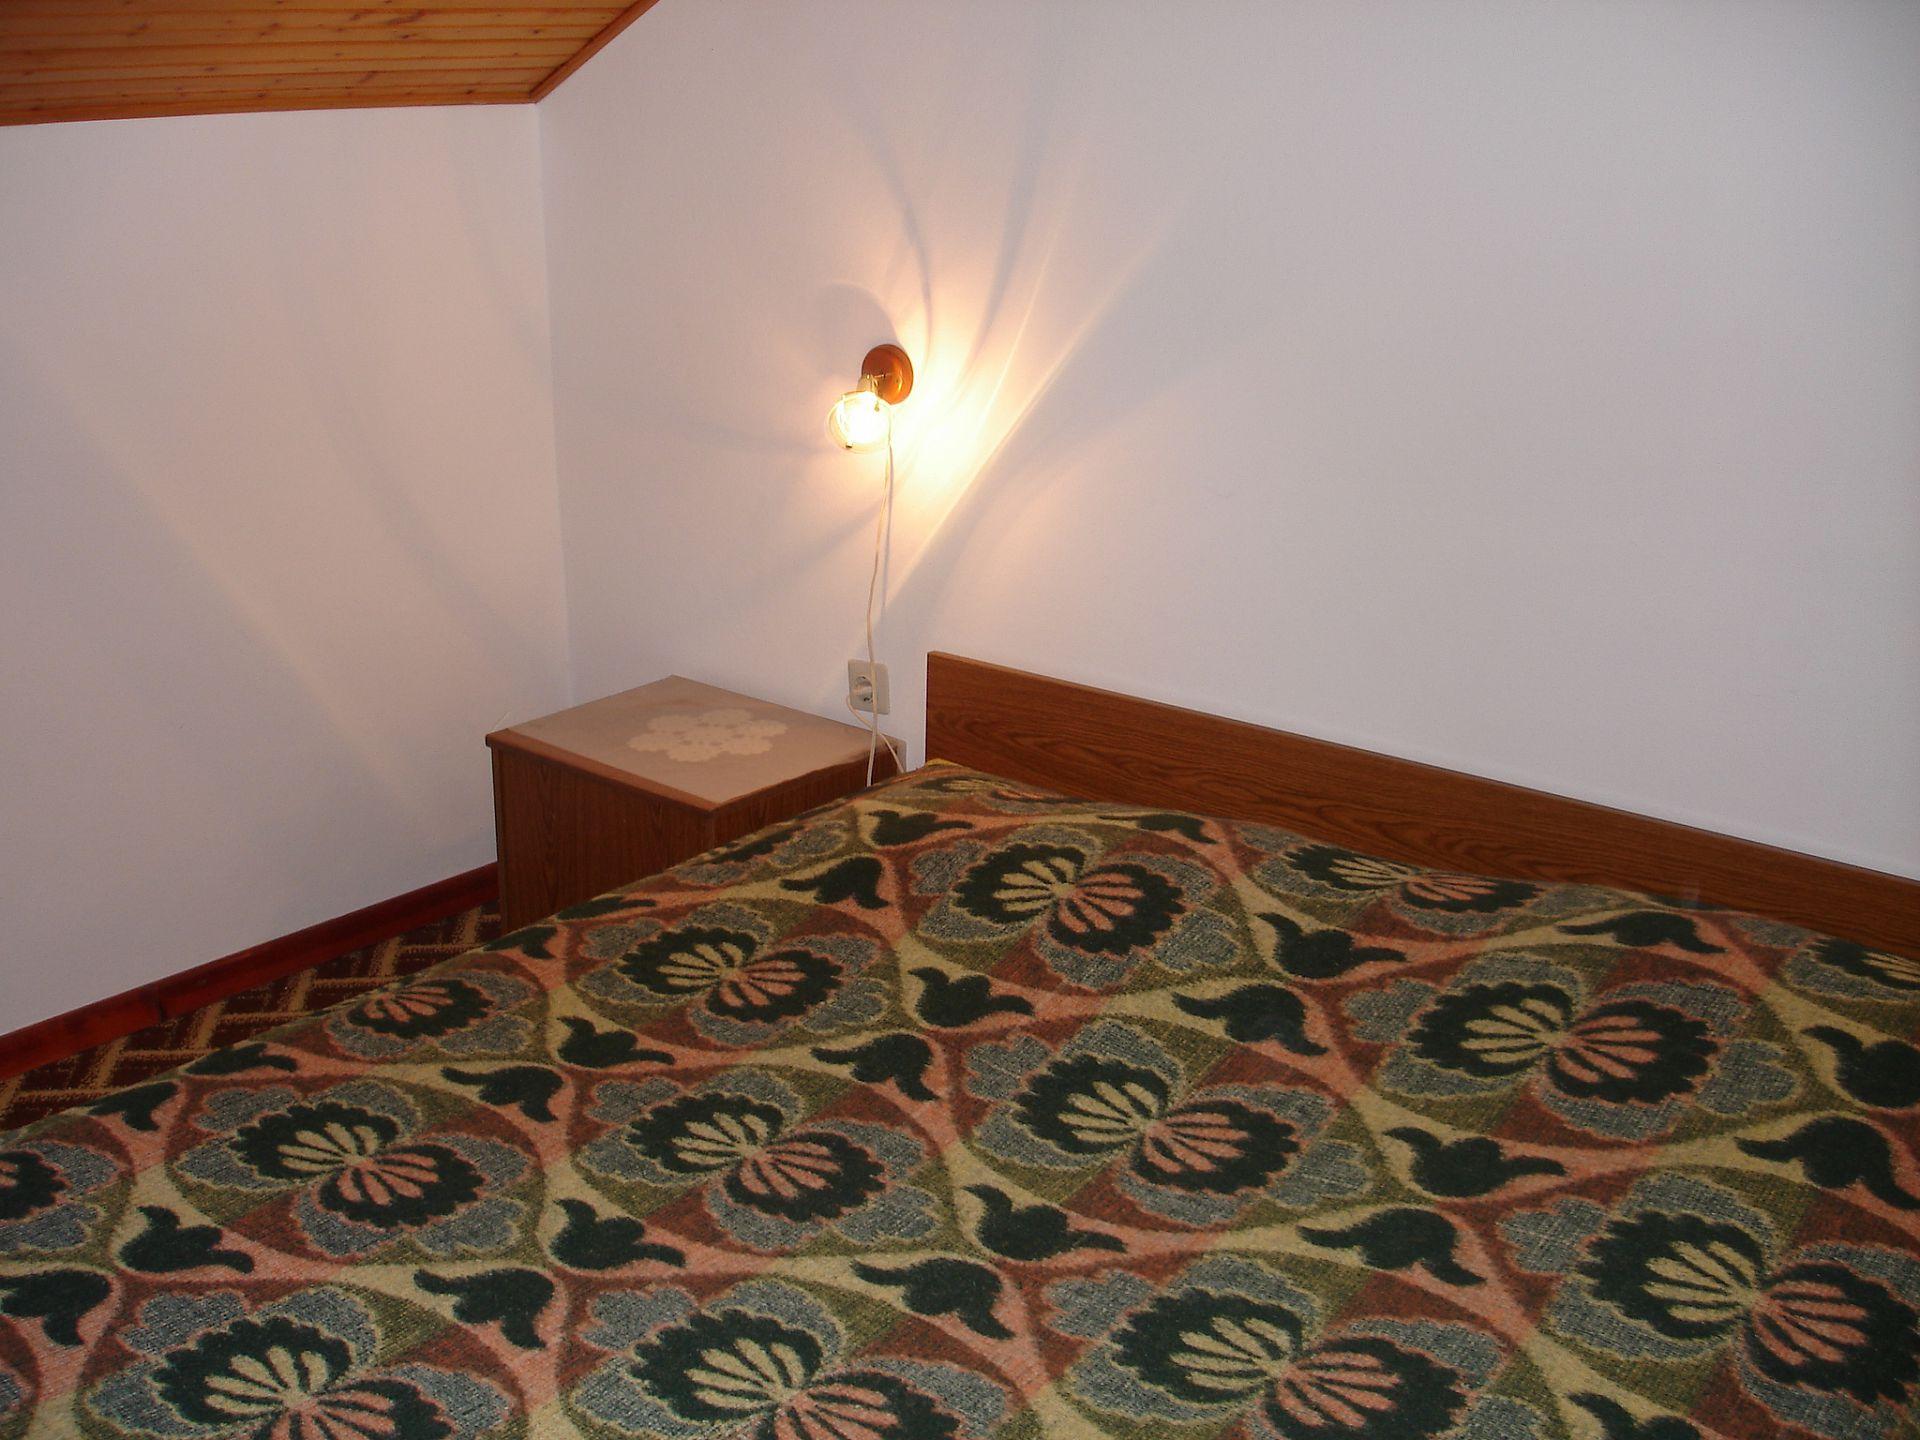 Ferienwohnung Ankica SA1(2) - Korcula (739749), Korčula, Insel Korcula, Dalmatien, Kroatien, Bild 9